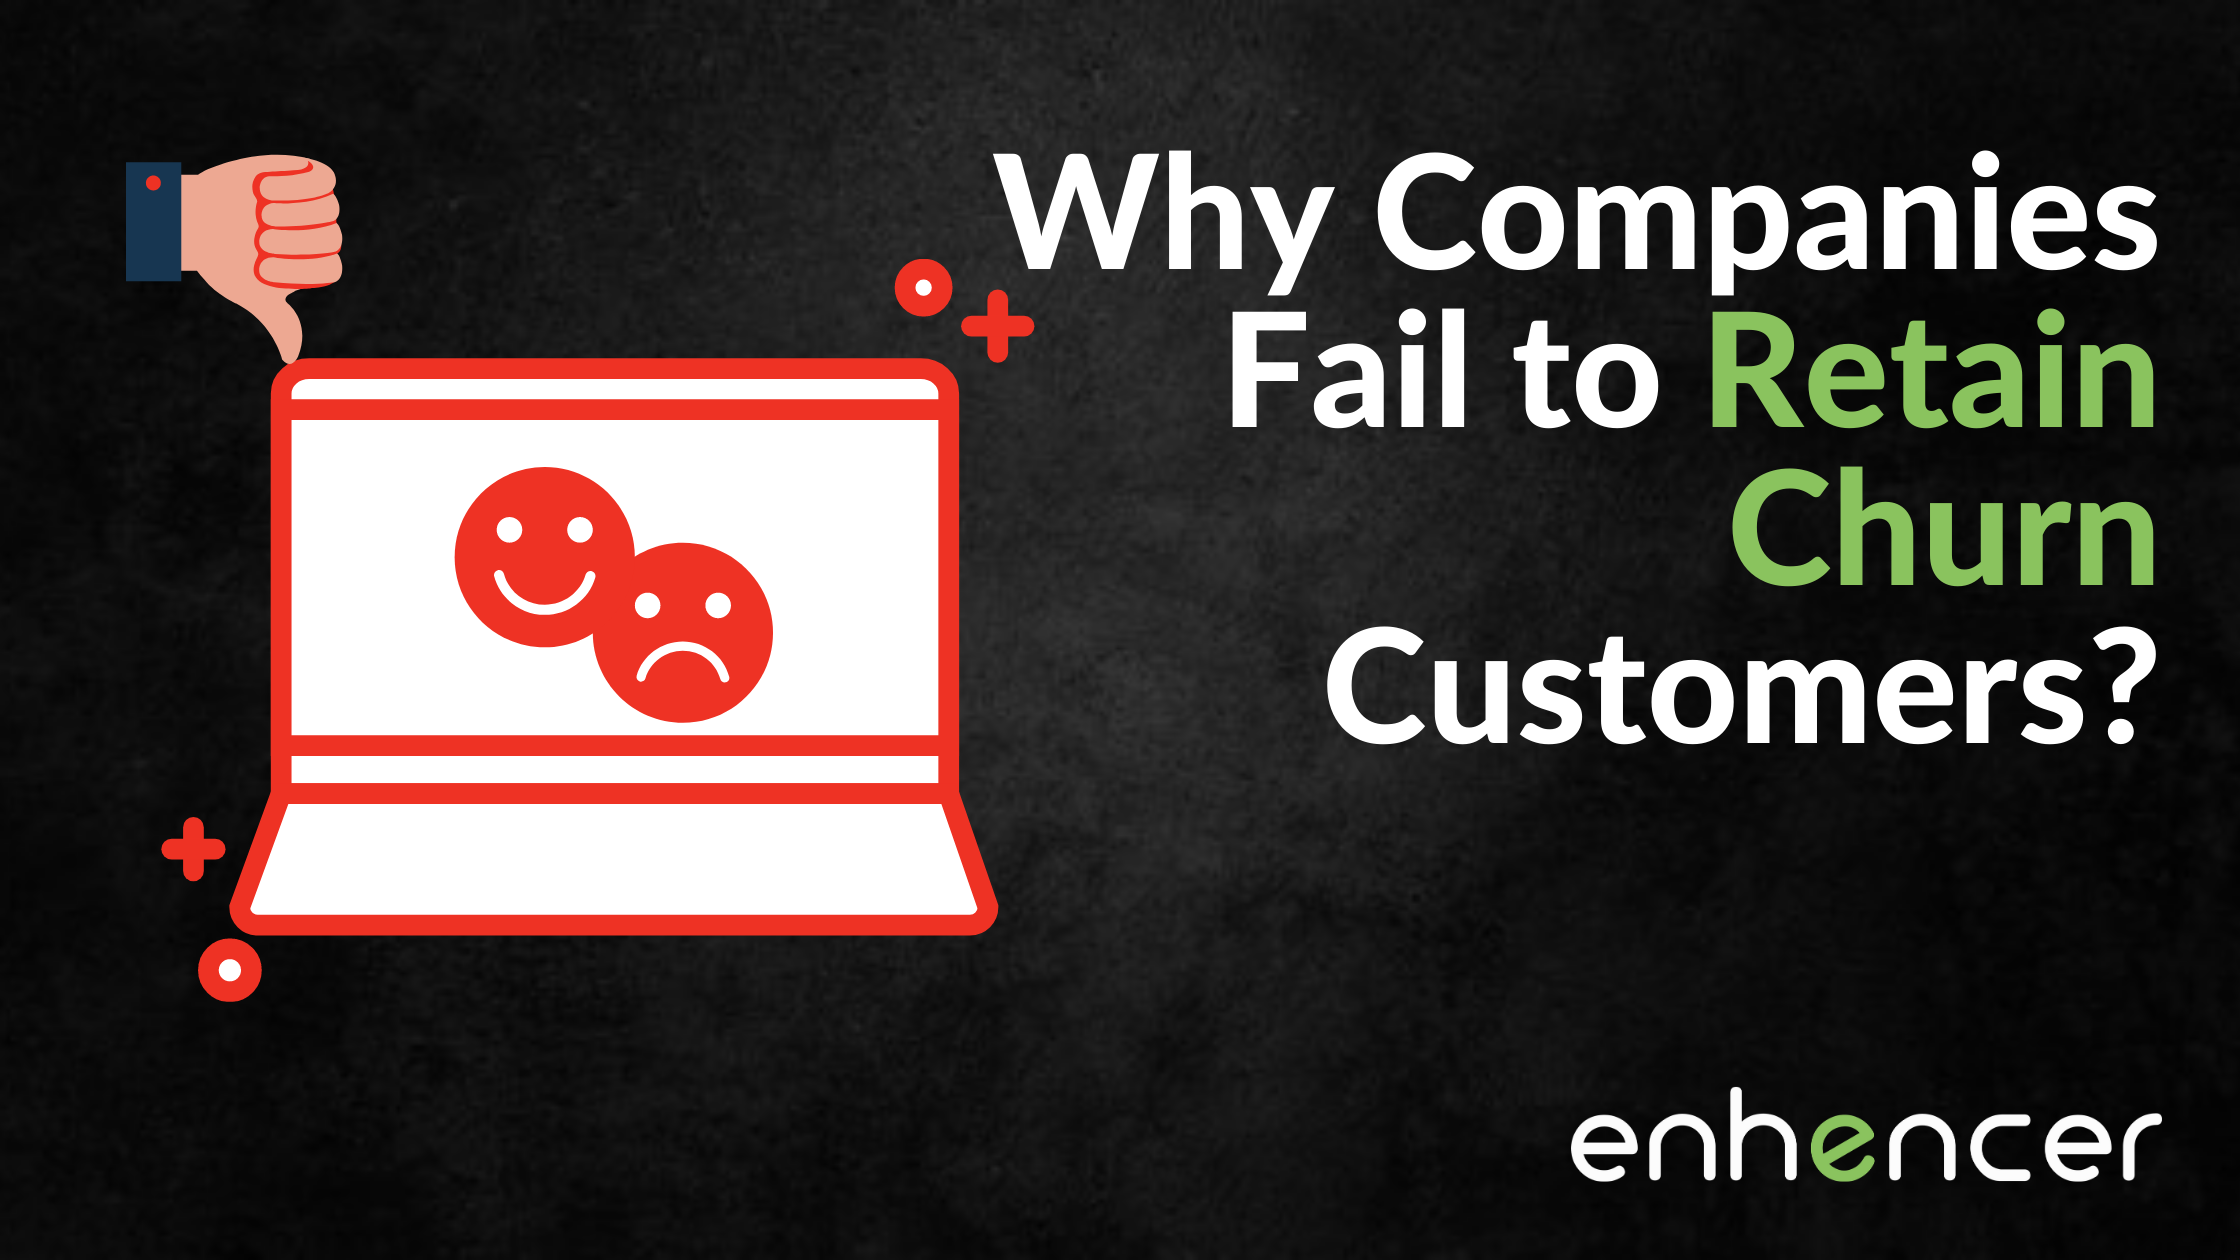 Why do Companies Fail to Retain Churn Customers?